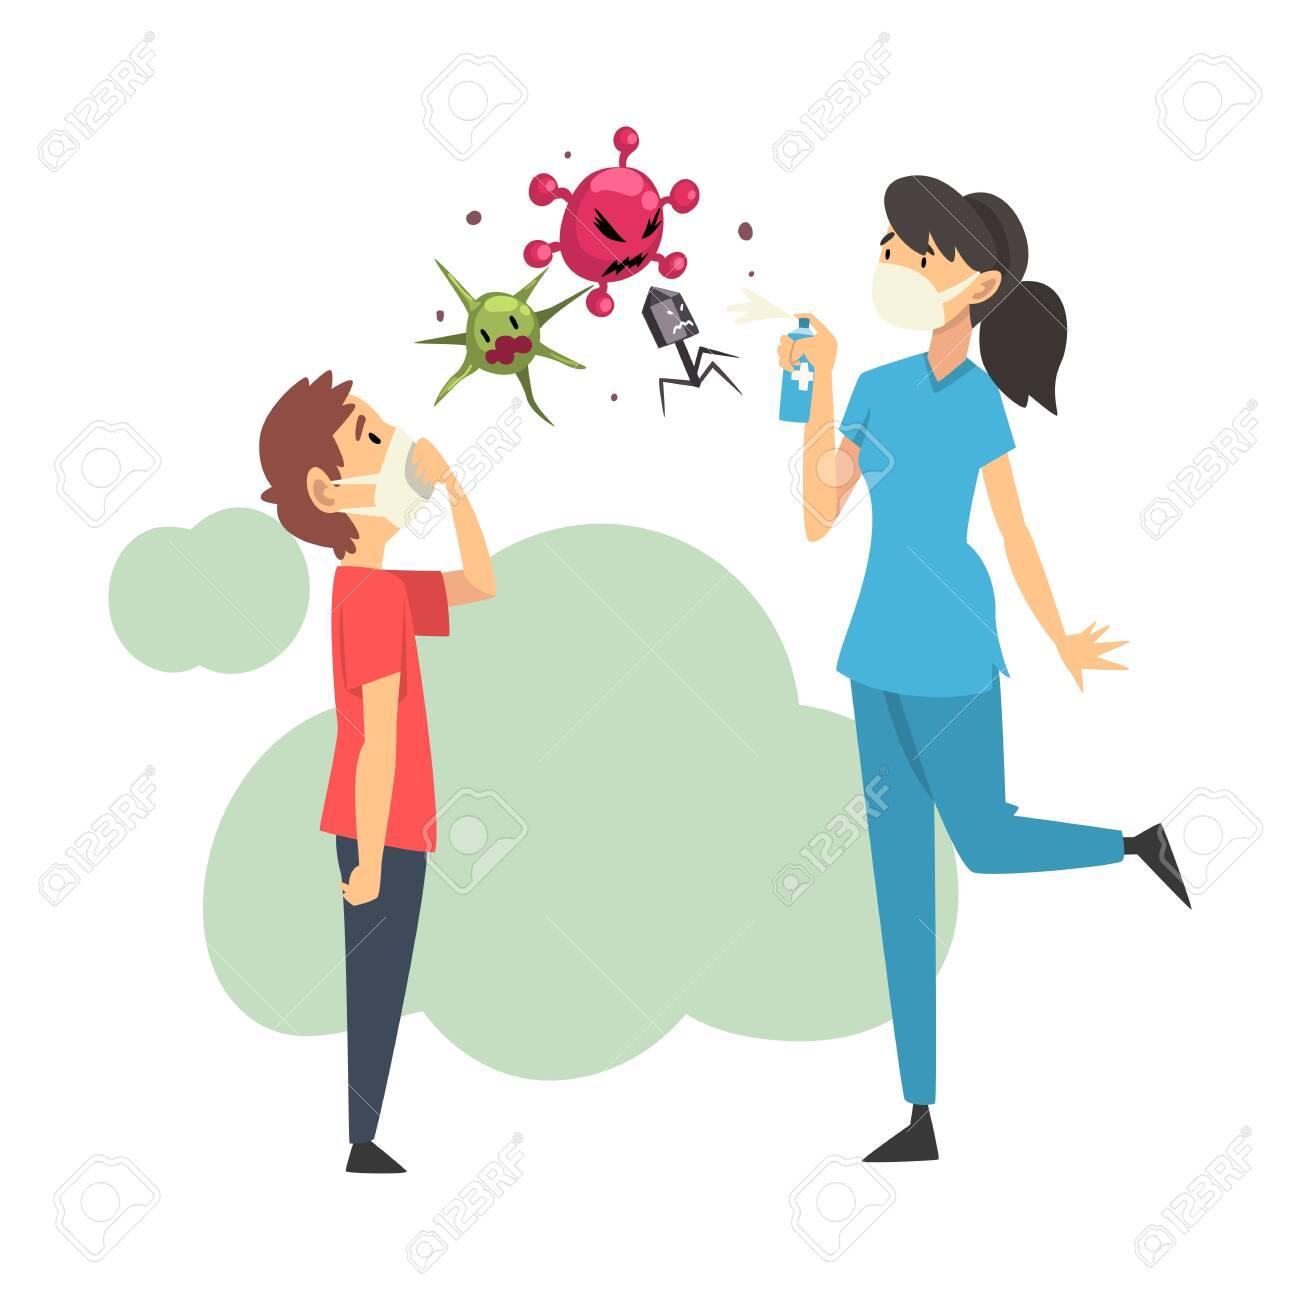 Female doctor and boy in medical masks kill viruses with balloon cartoon vector illustration - 131856989